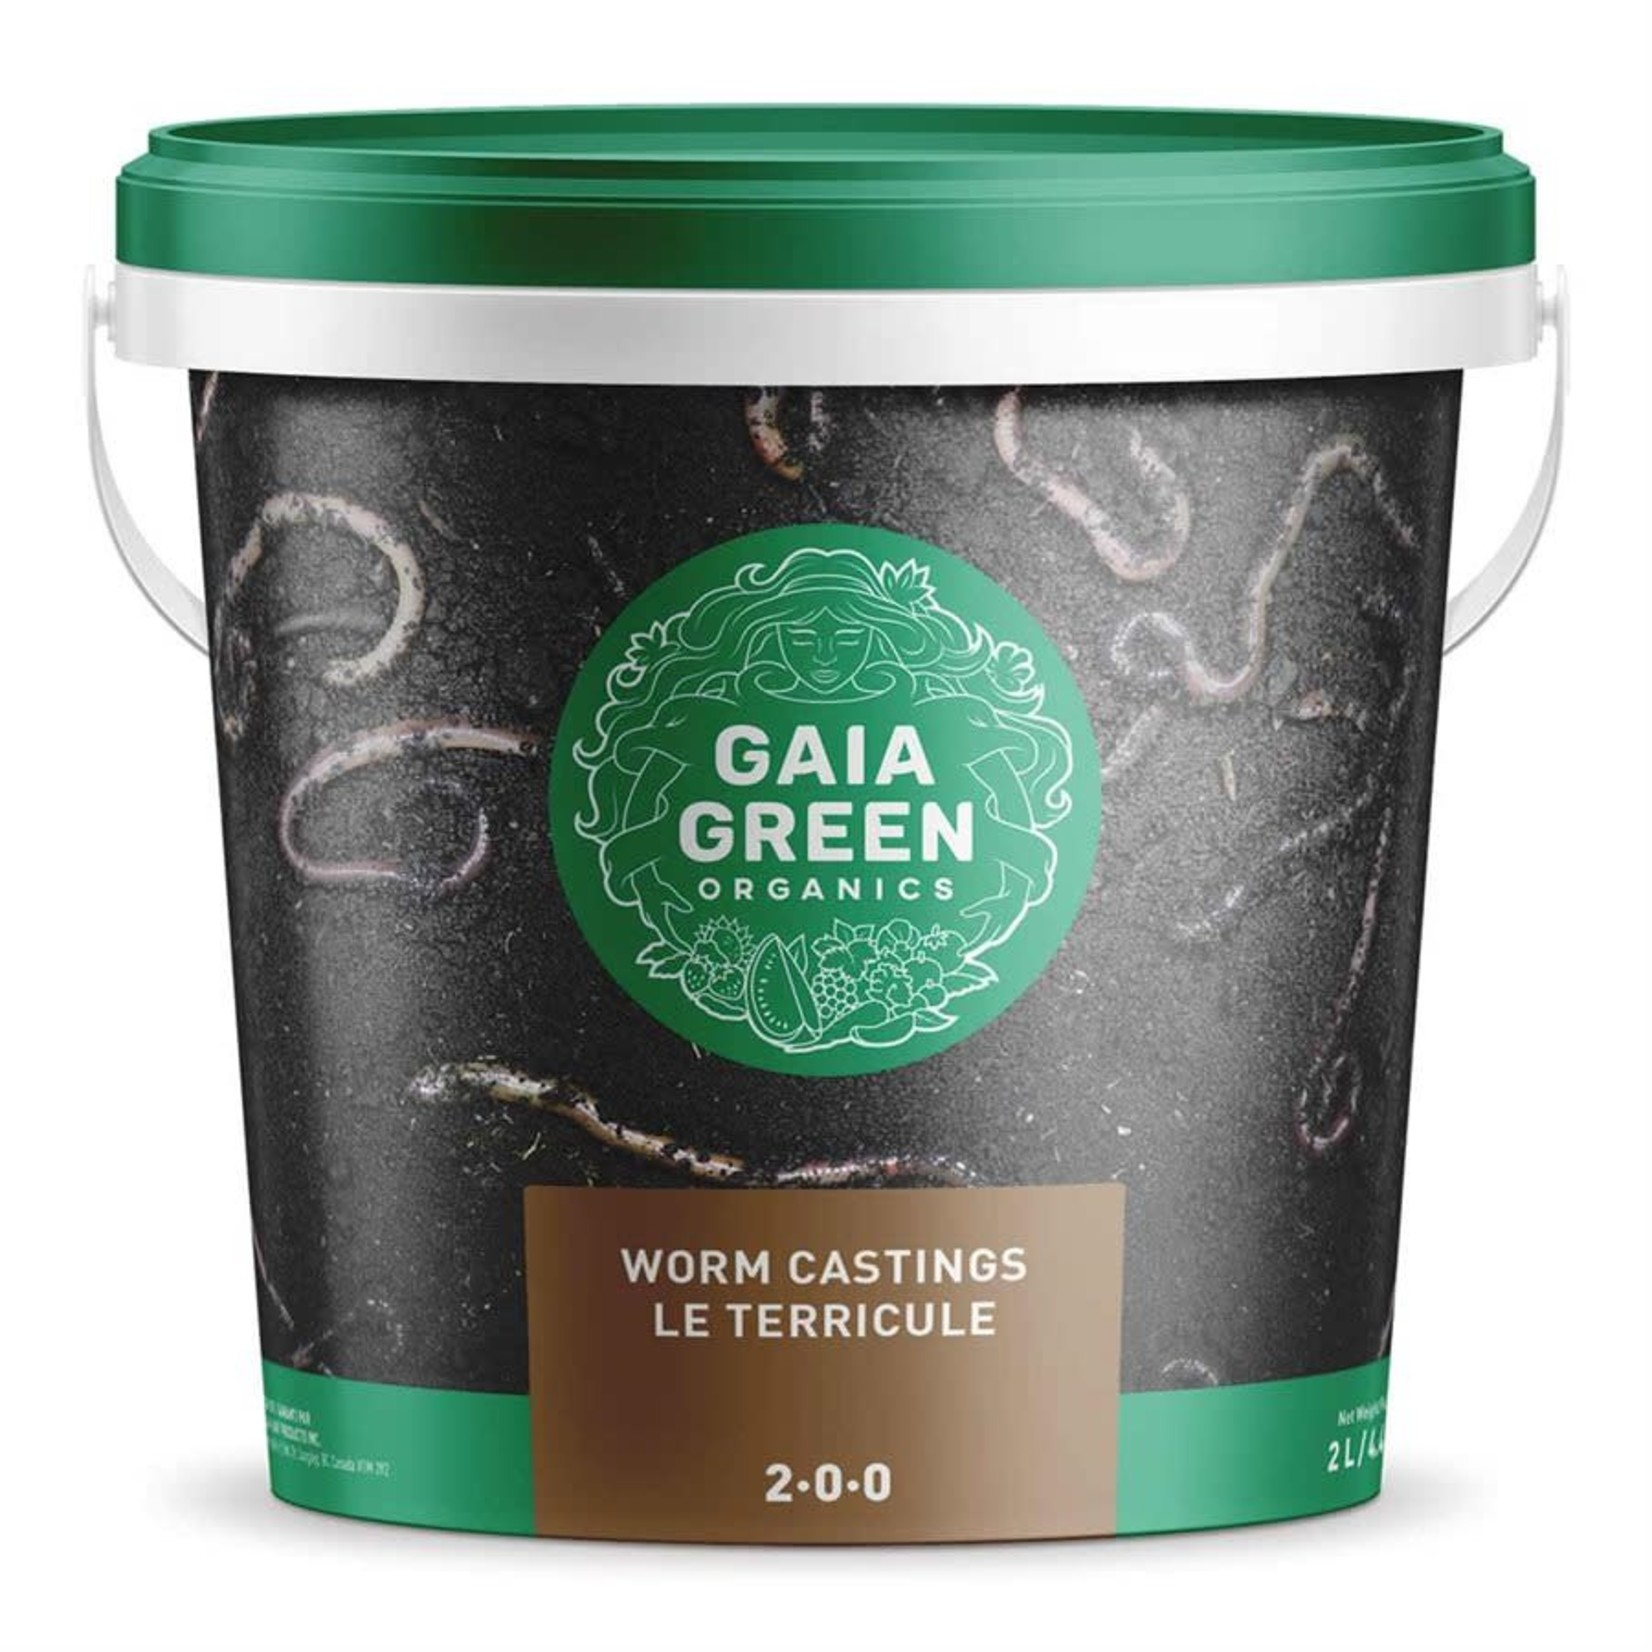 Gaia Green Worm Castings 2-0-0, 2 L